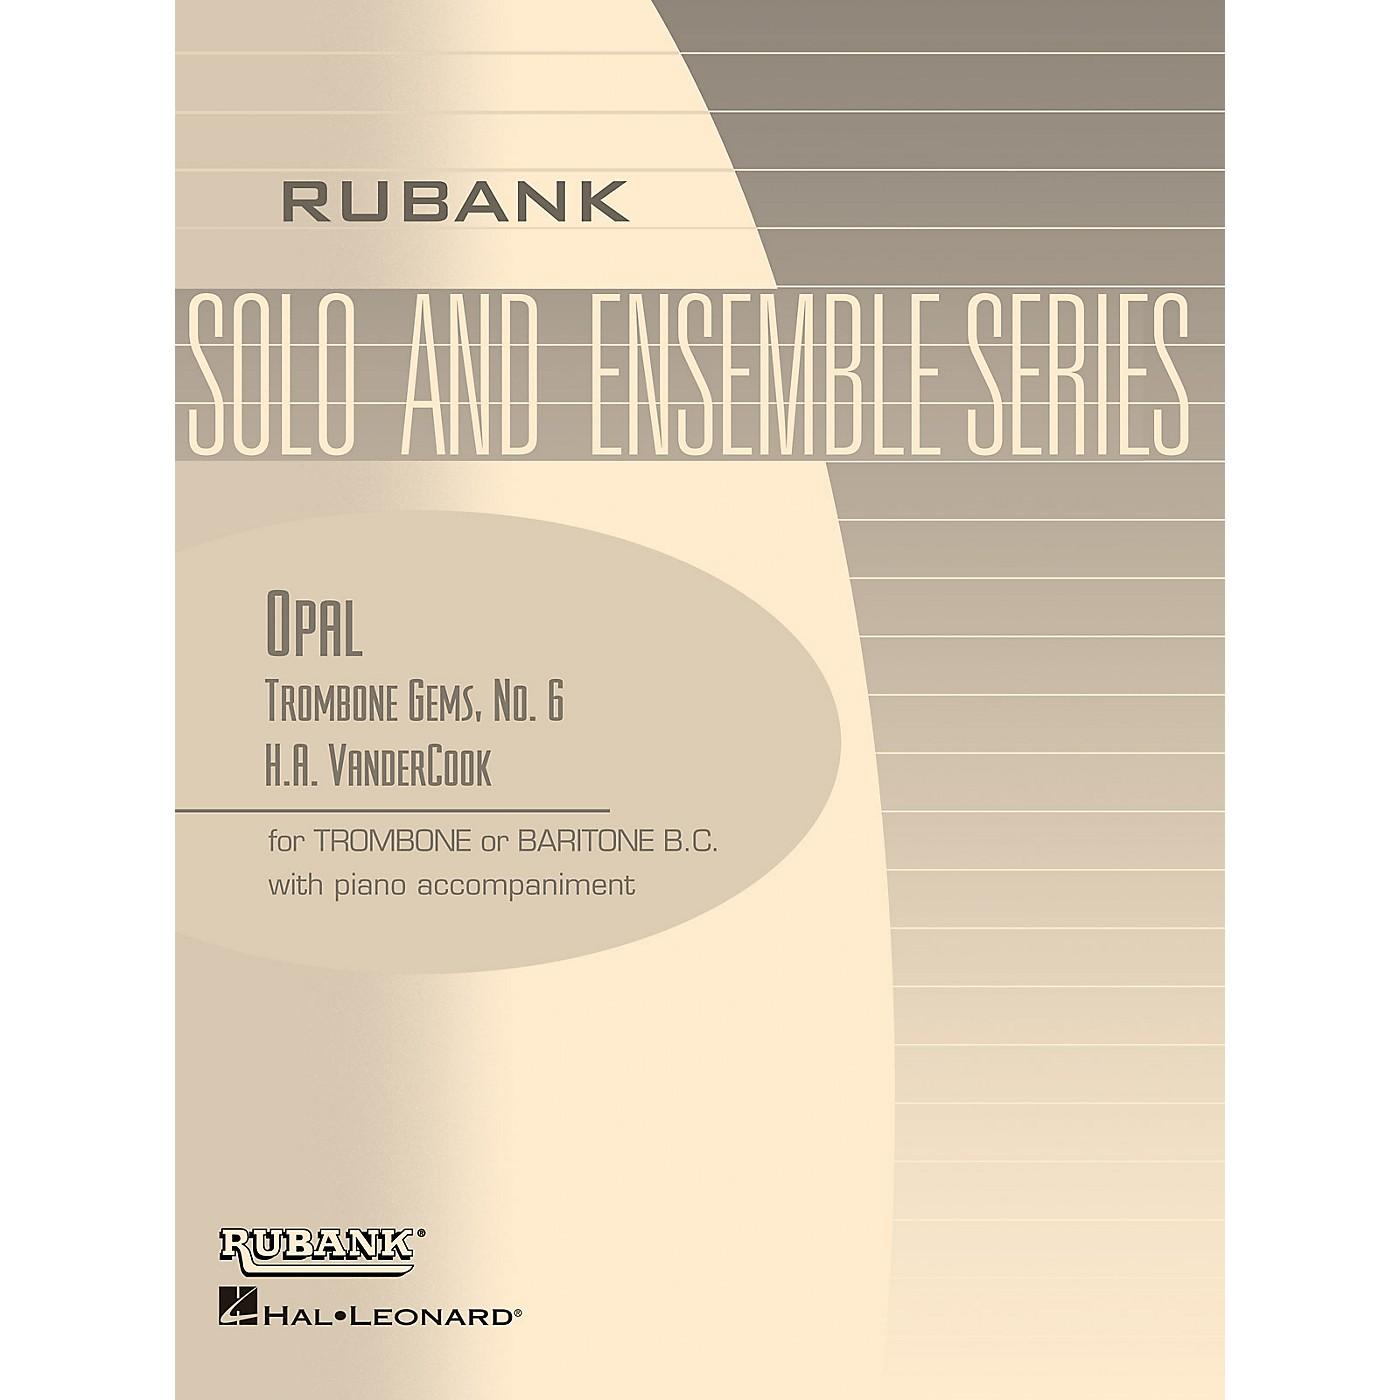 Rubank Publications Opal (Trombone (Baritone B.C.) Solo with Piano - Grade 2) Rubank Solo/Ensemble Sheet Series thumbnail